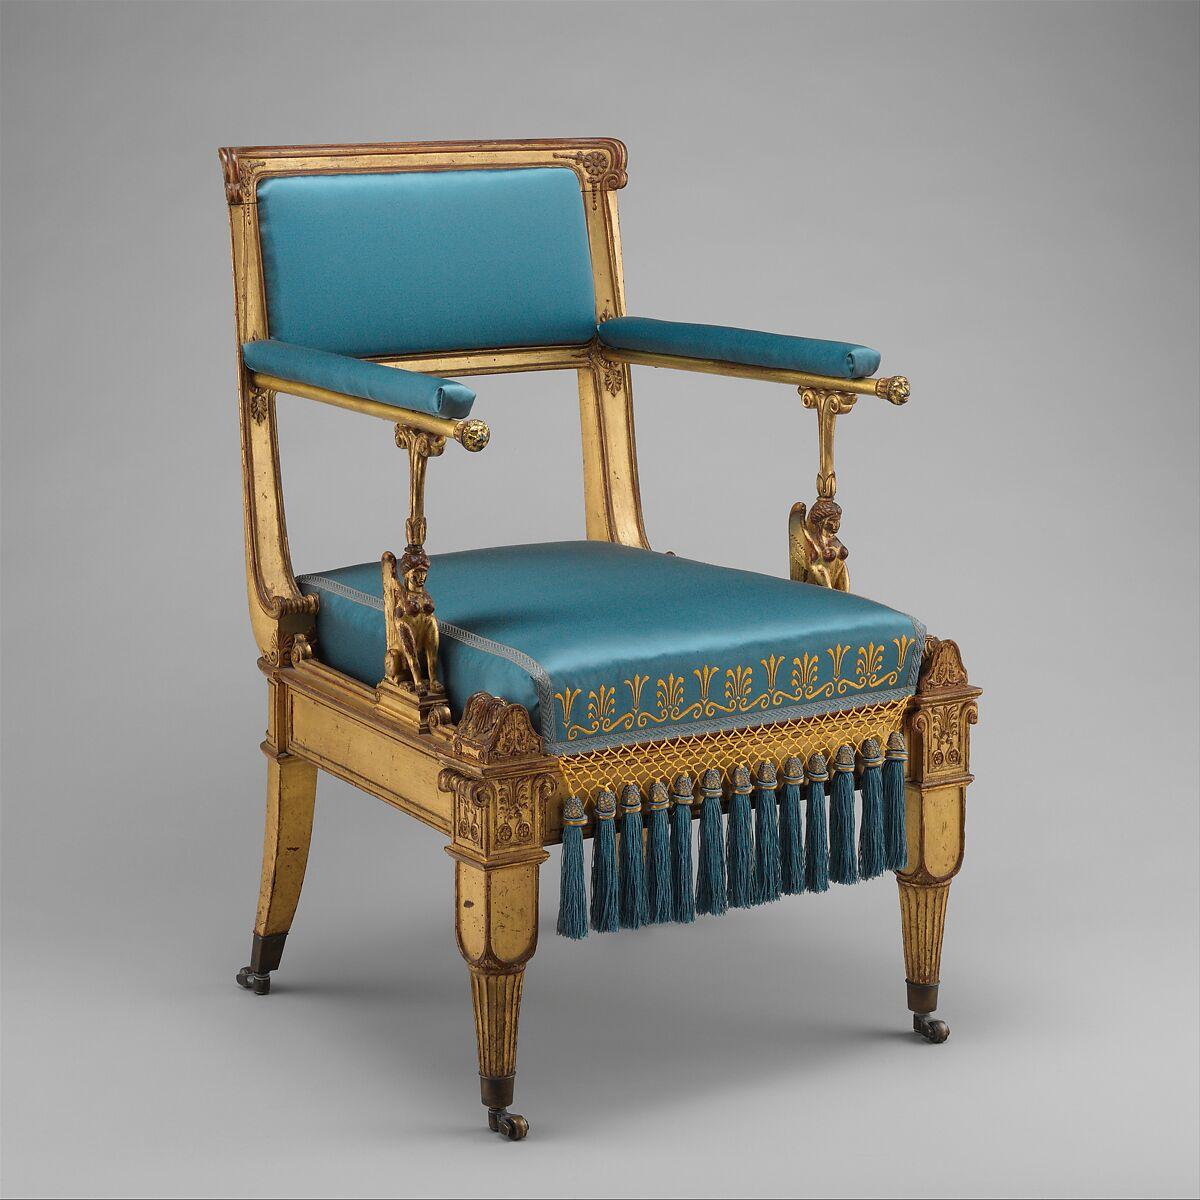 karl friedrich schinkel armchair german berlin the met. Black Bedroom Furniture Sets. Home Design Ideas